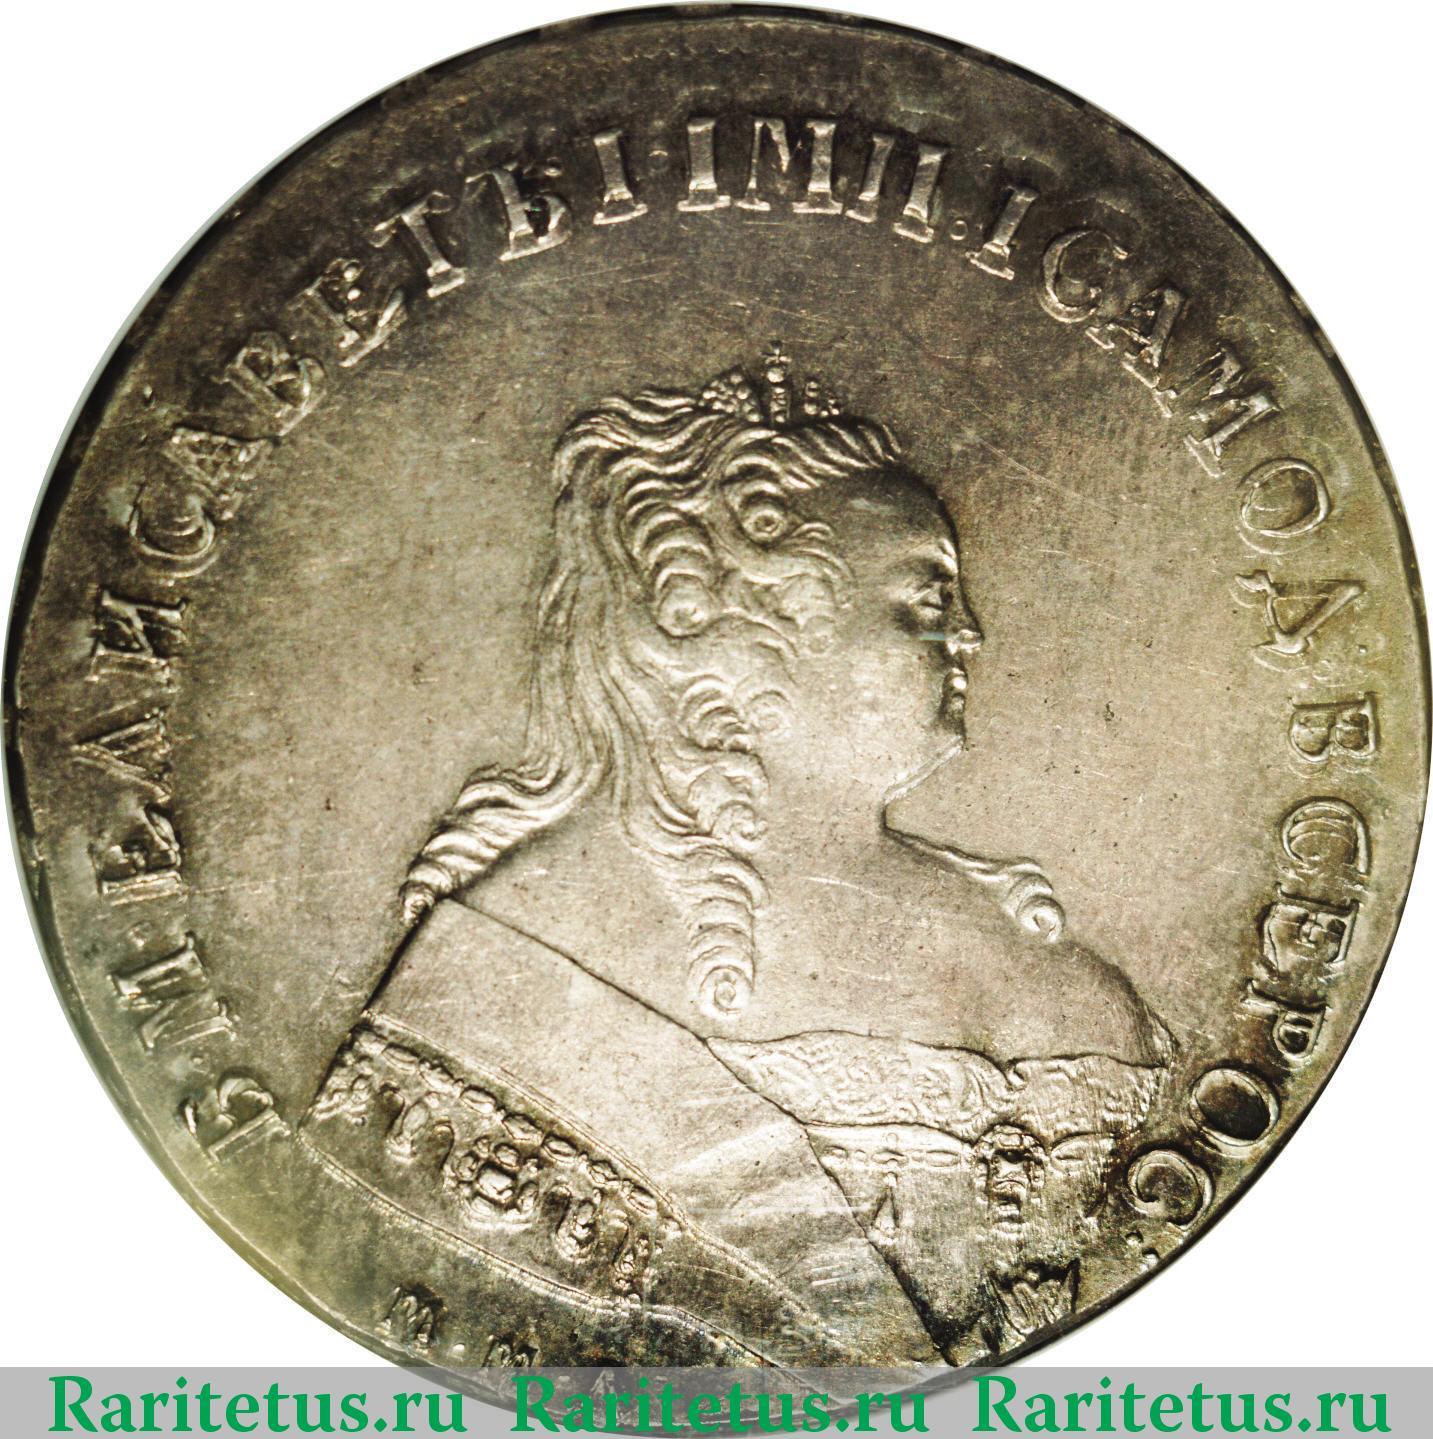 Цена деньги 1749 года спрос на металлоискатели